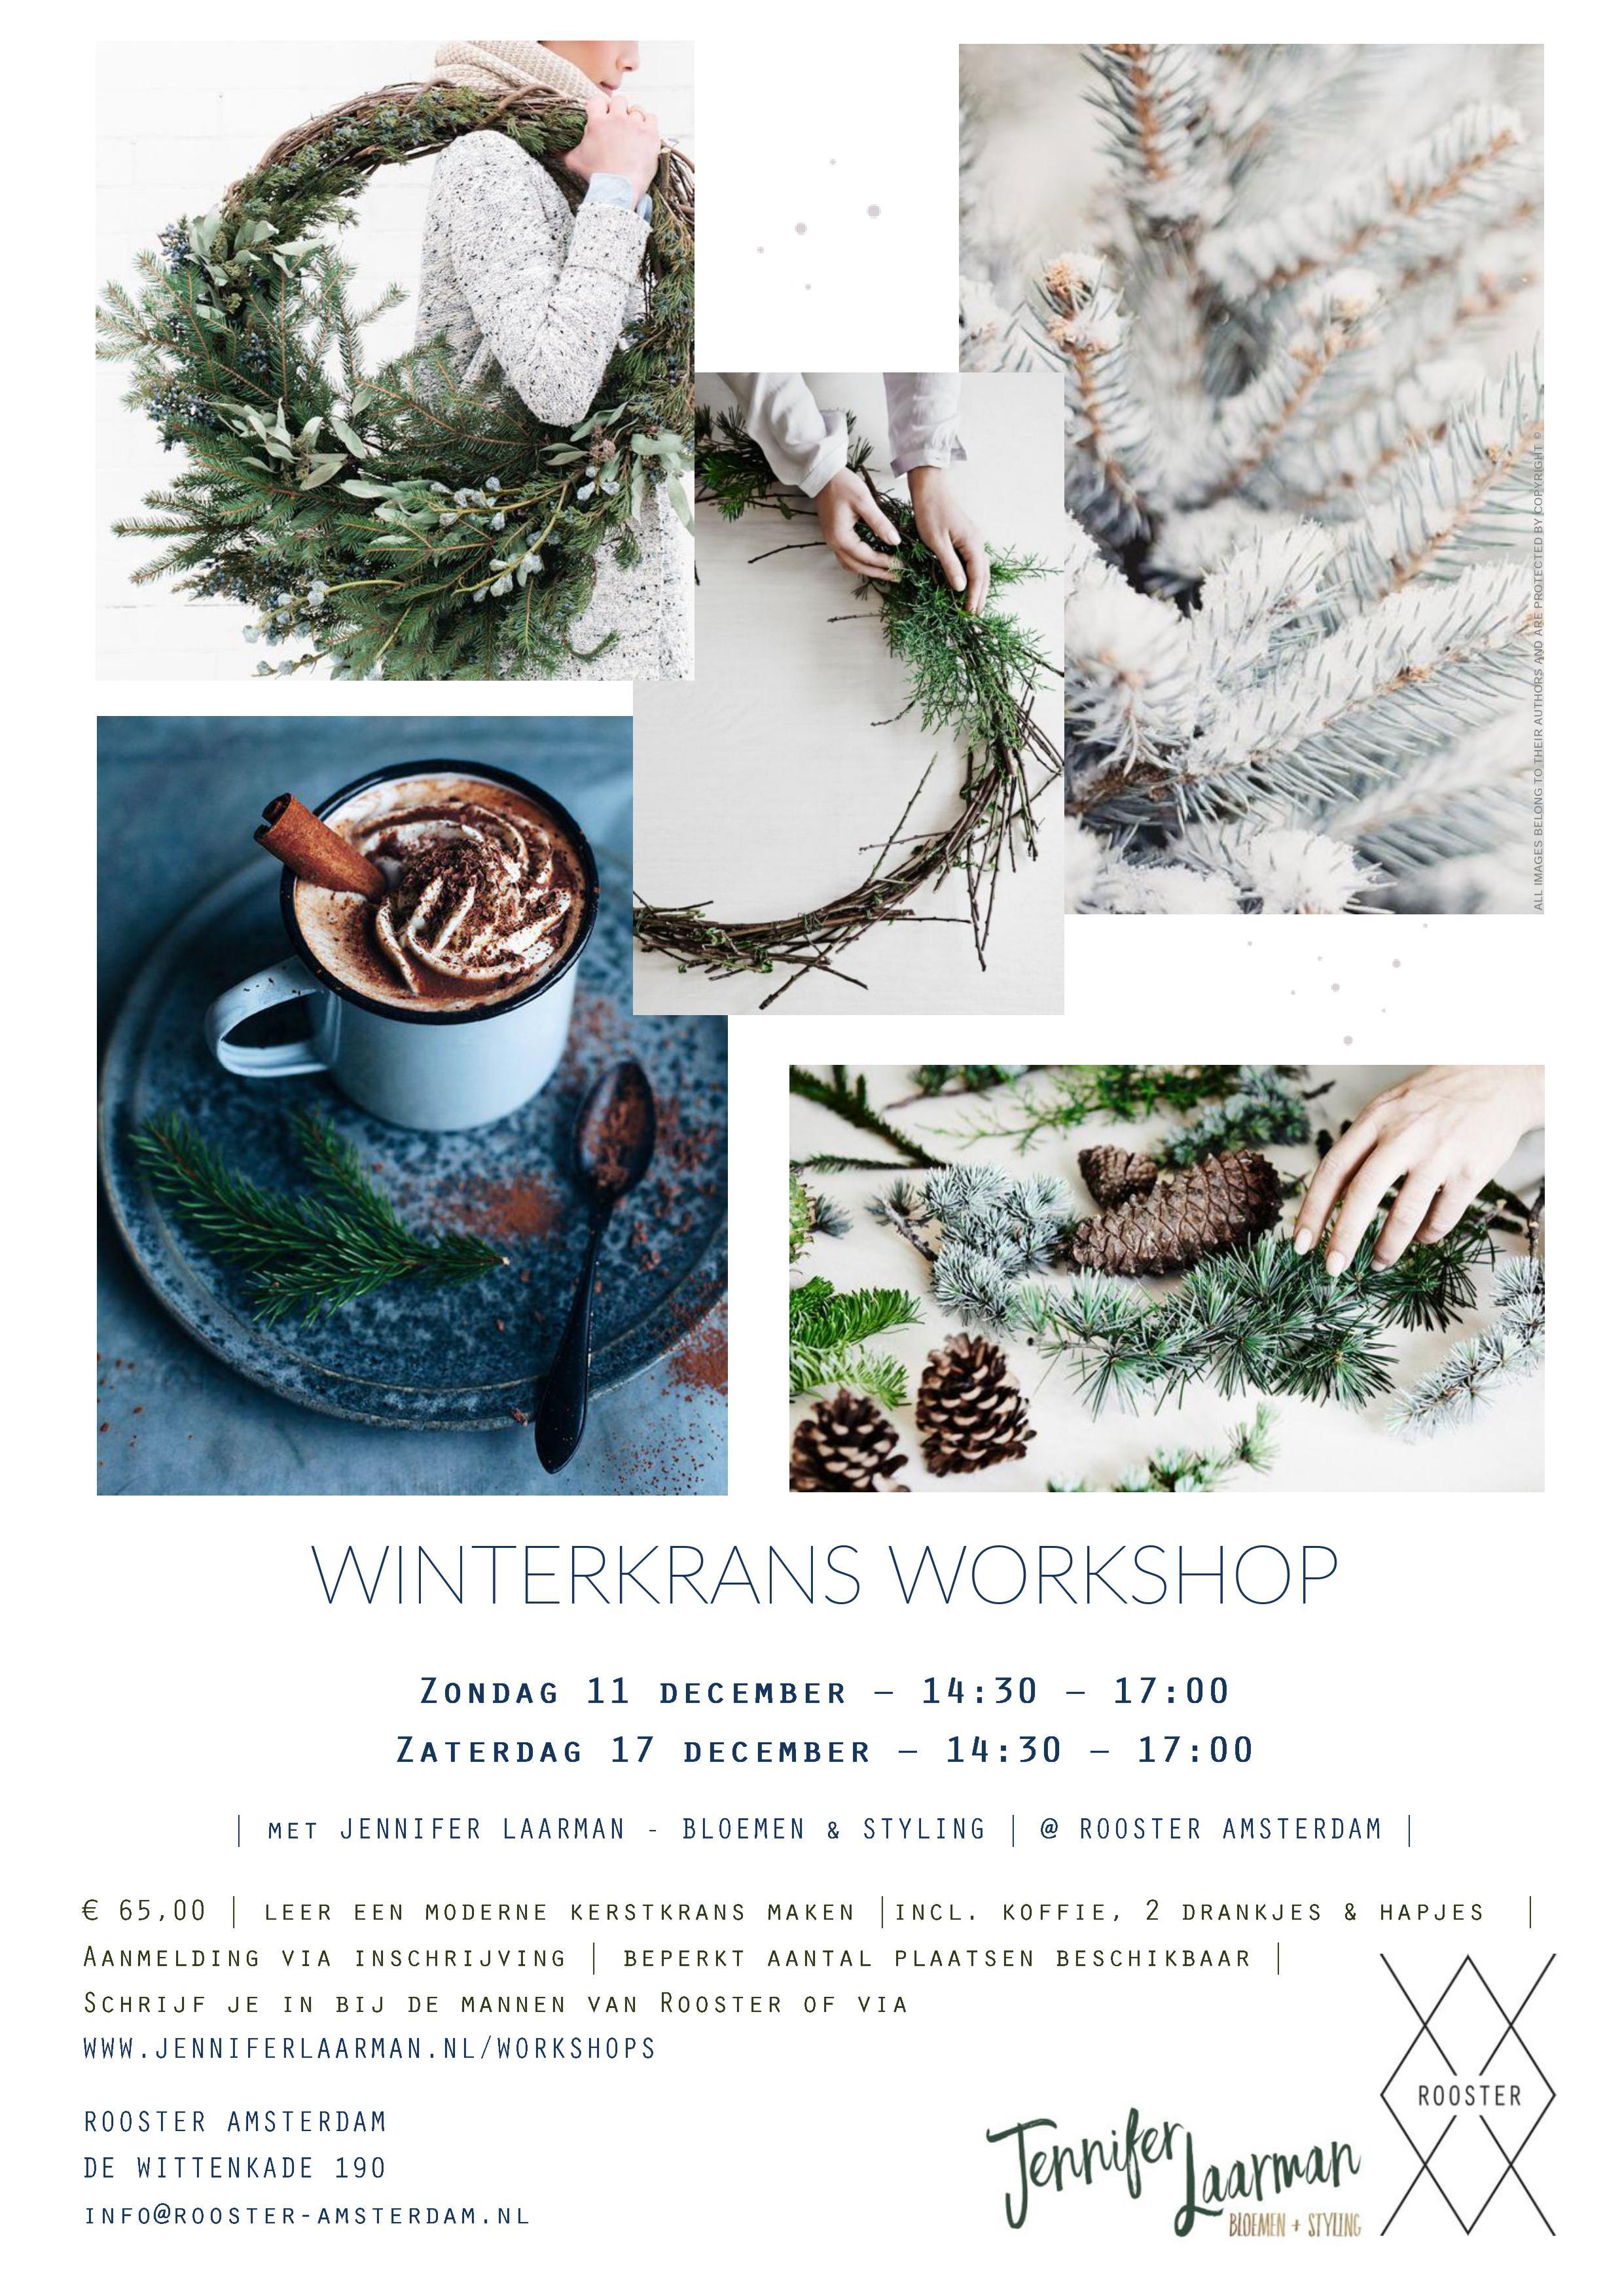 Winterkrans workshop Jennifer Laarman Rooster Amsterdam JPG.jpg